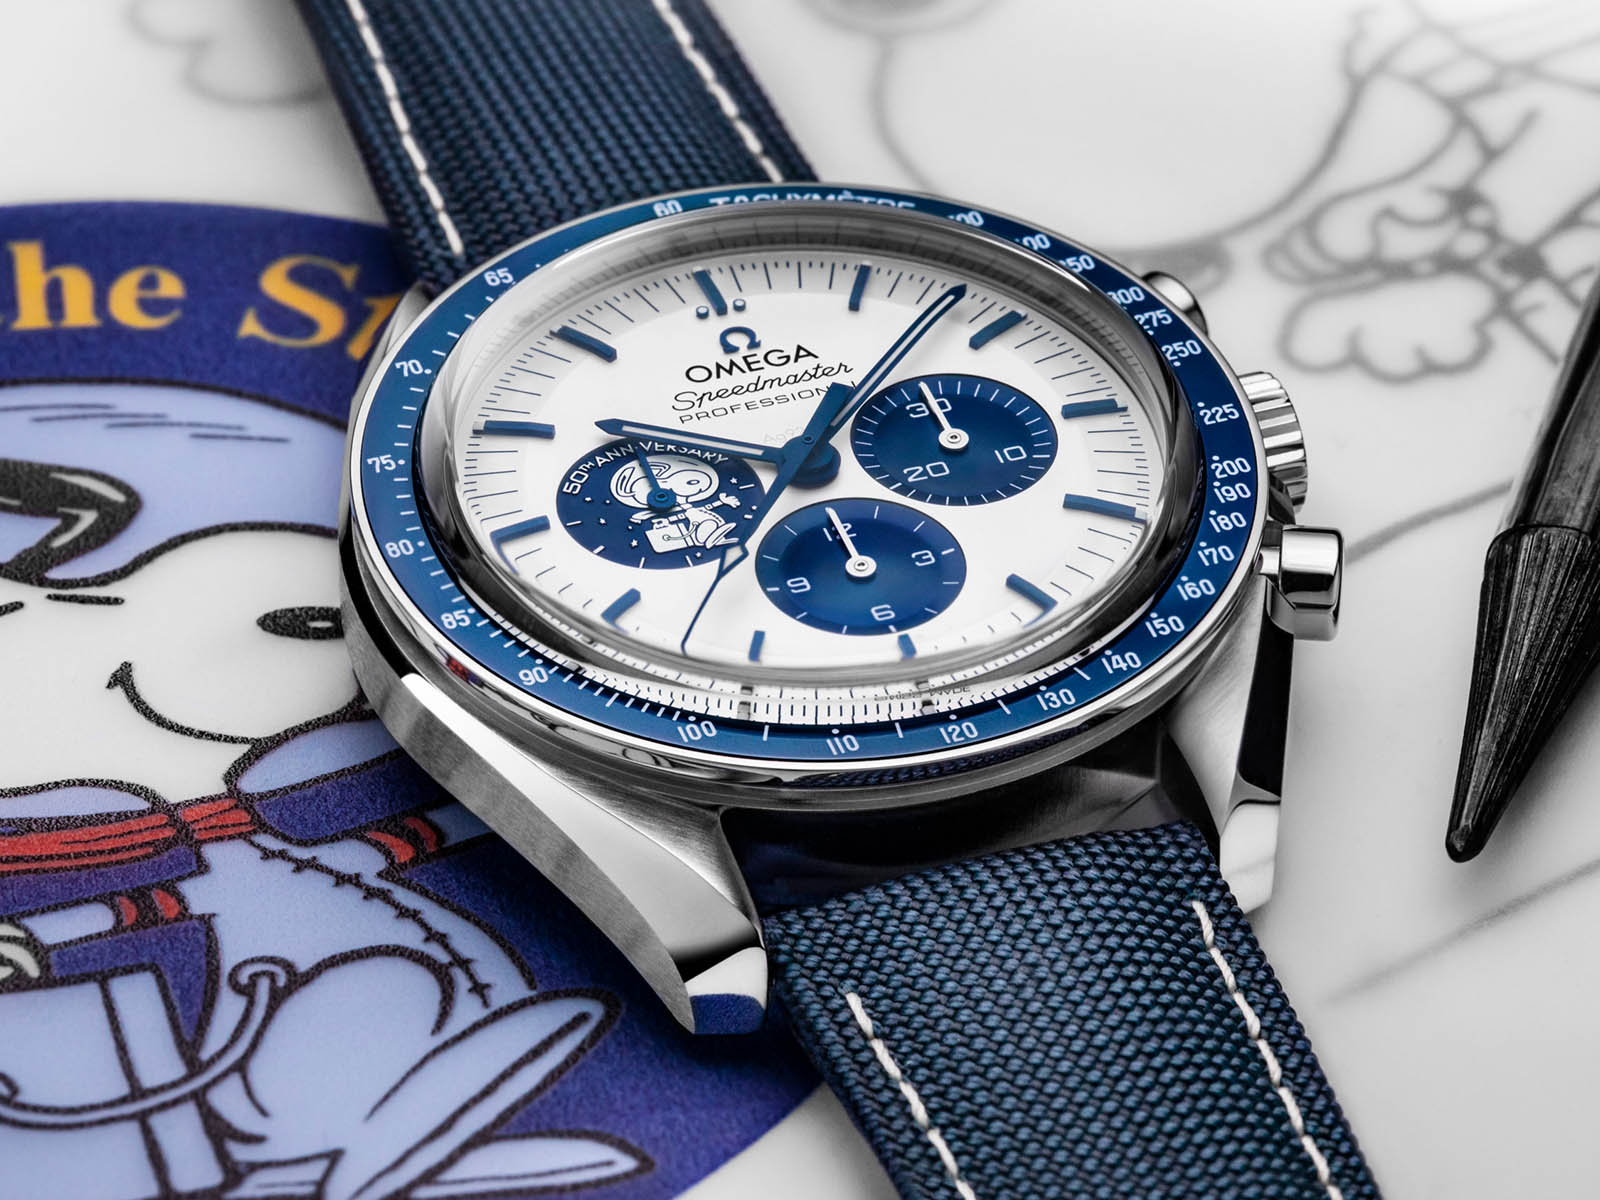 310-32-42-50-02-001-omega-speedmaster-silver-snoopy-award-50th-anniversary-2.jpg